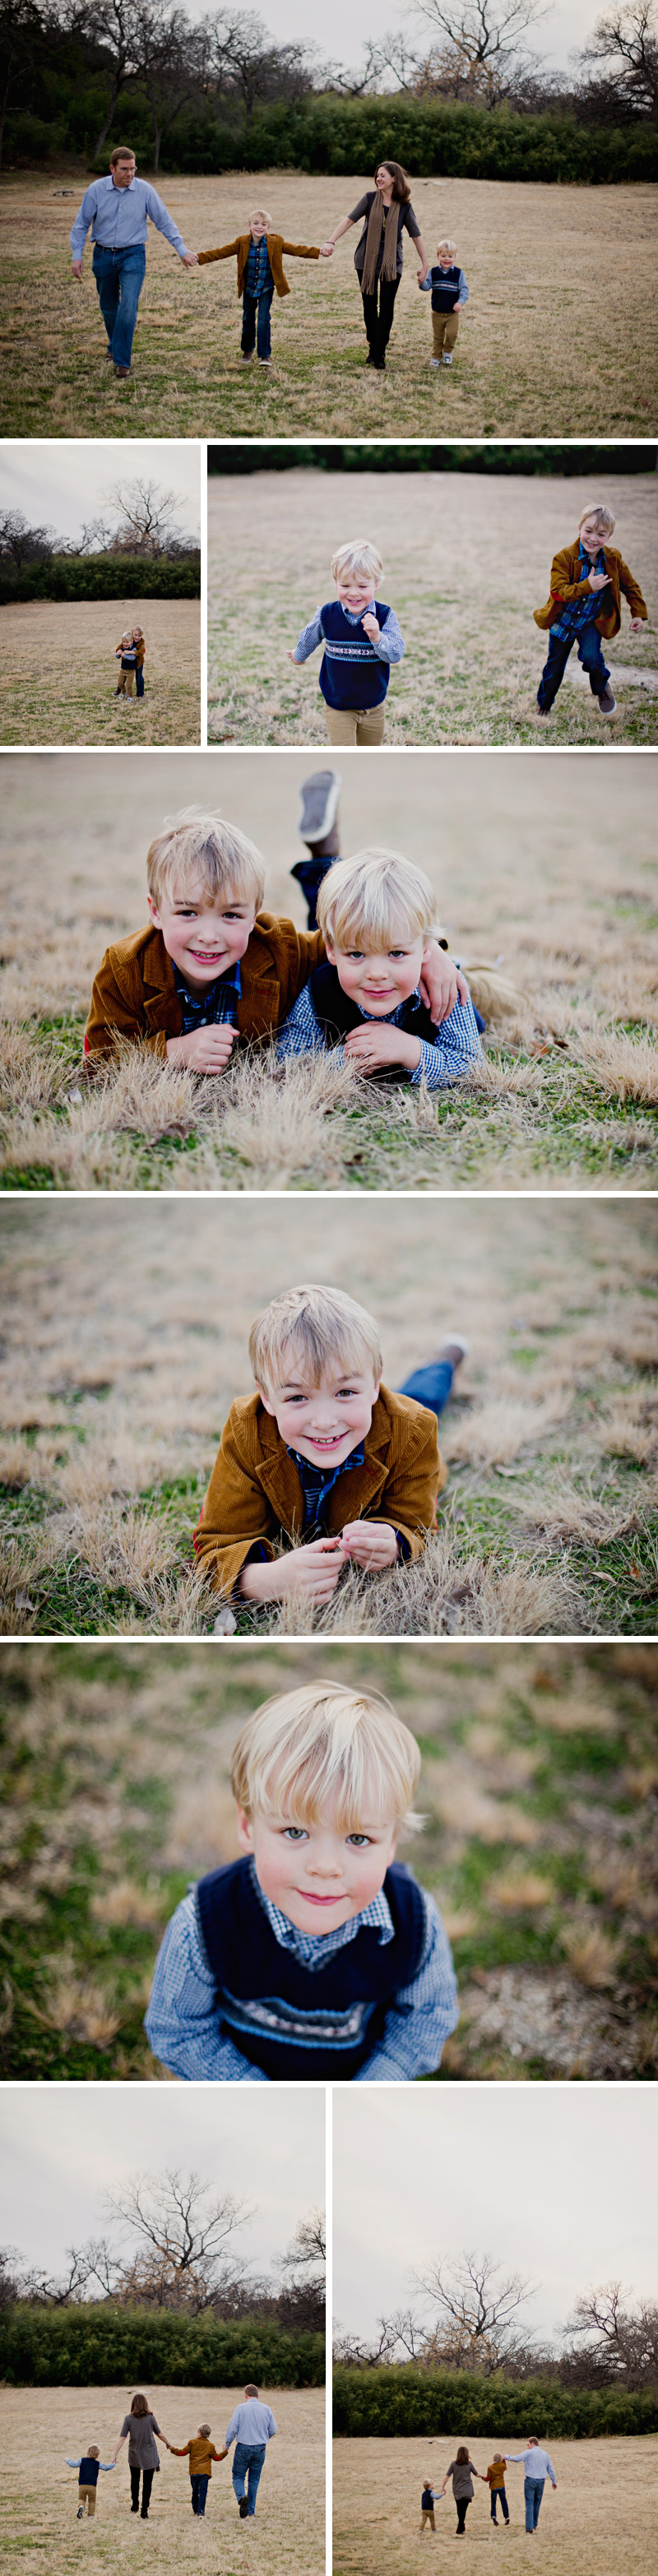 Dallas-Family-Photographerc009